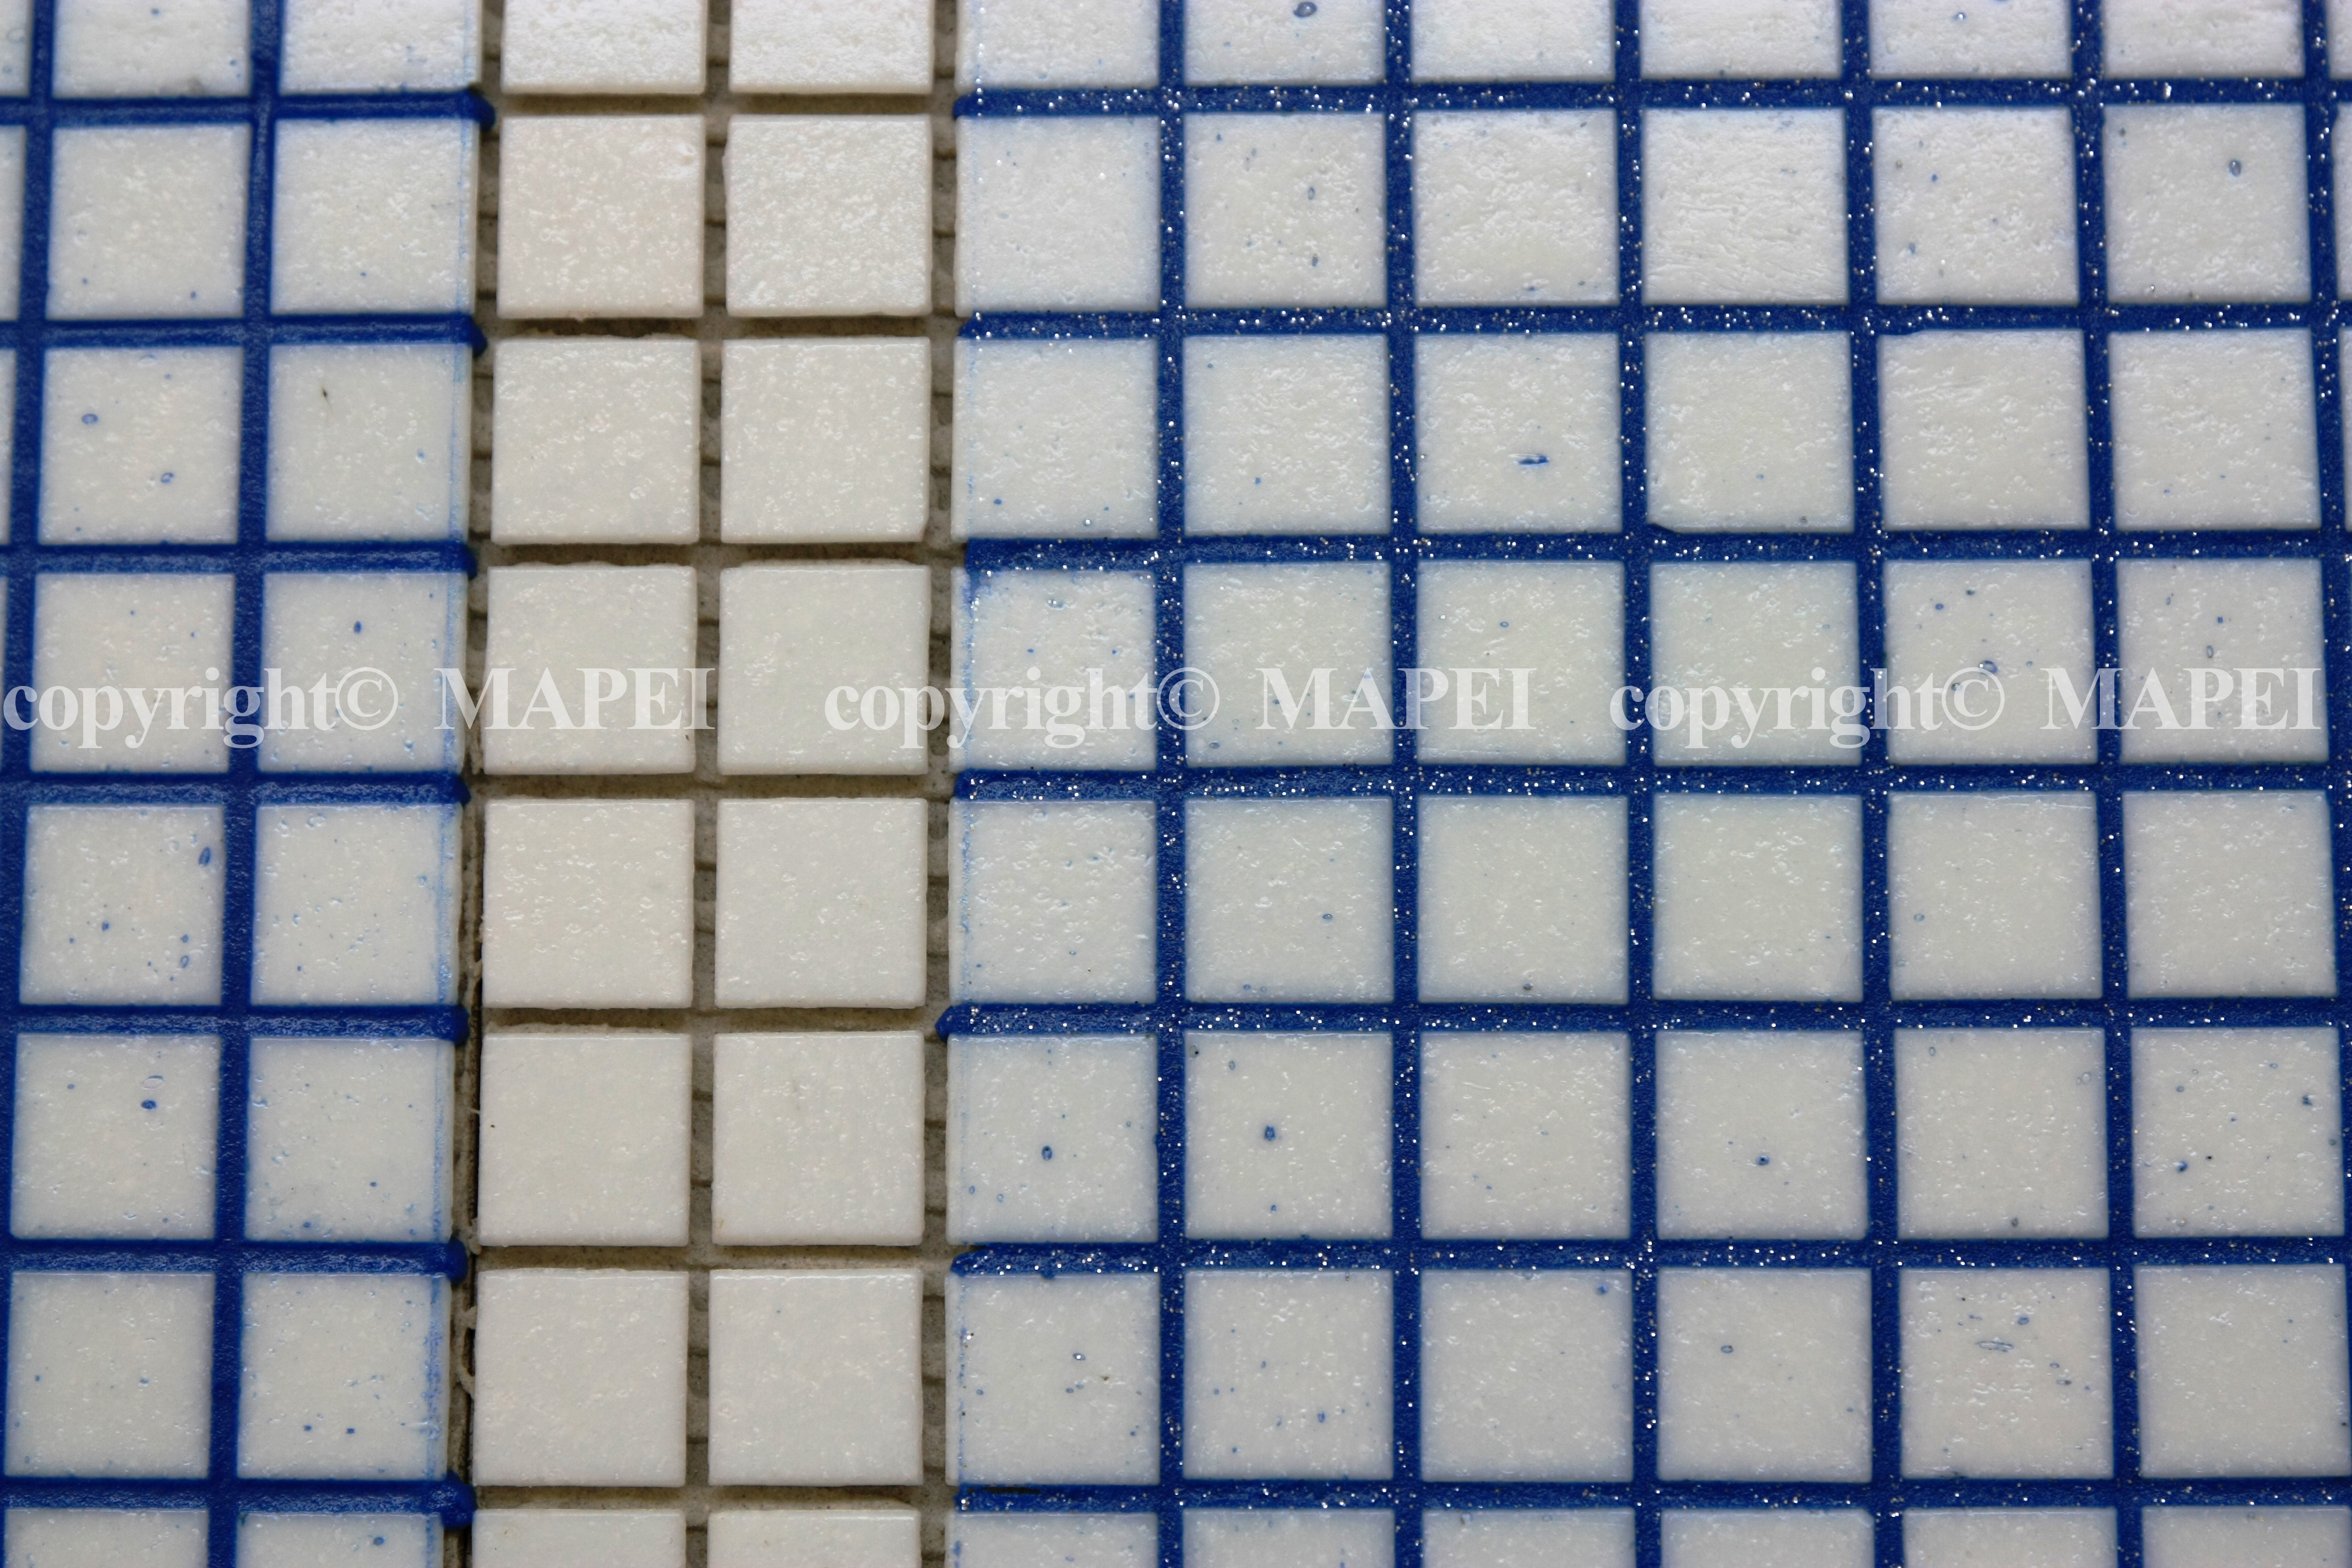 30. mozaic sticla chituit cu chit epoxidic si fulgi metalizati MAPEI - Poza 30